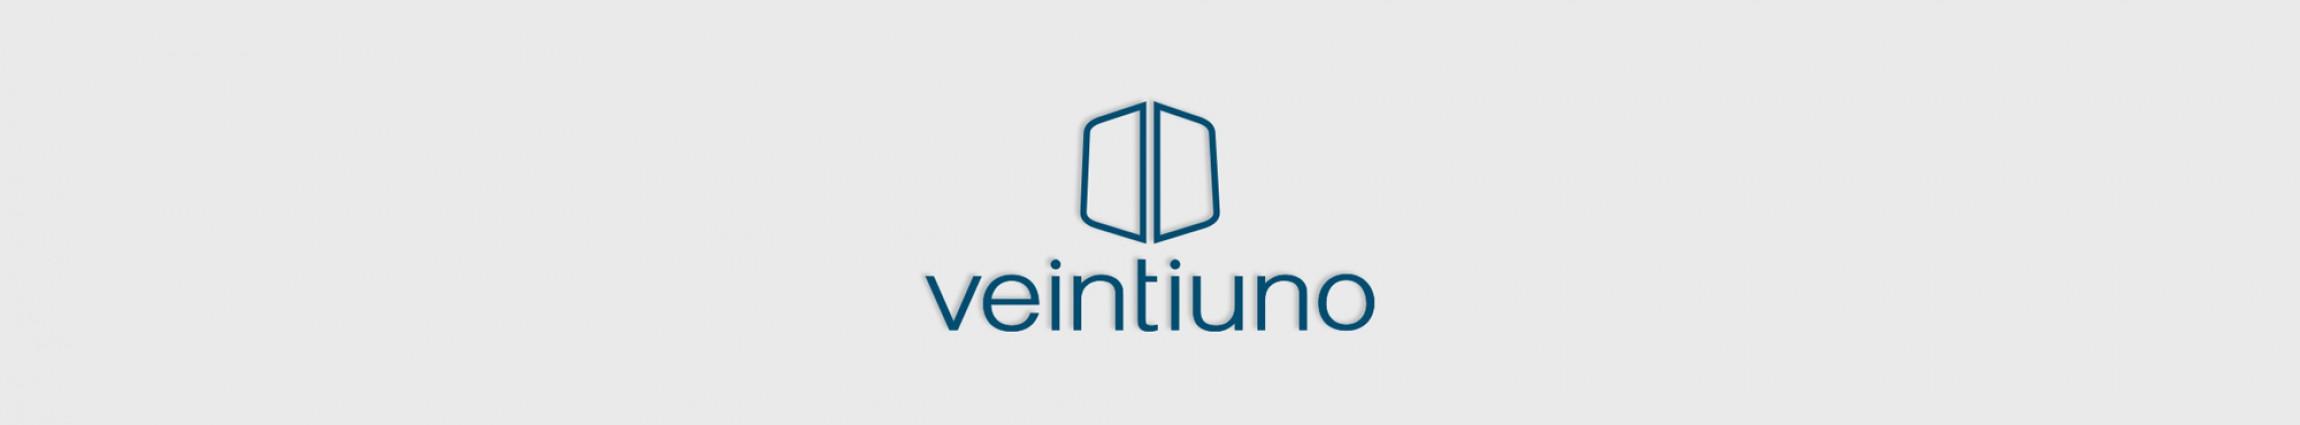 logo_veintiuno